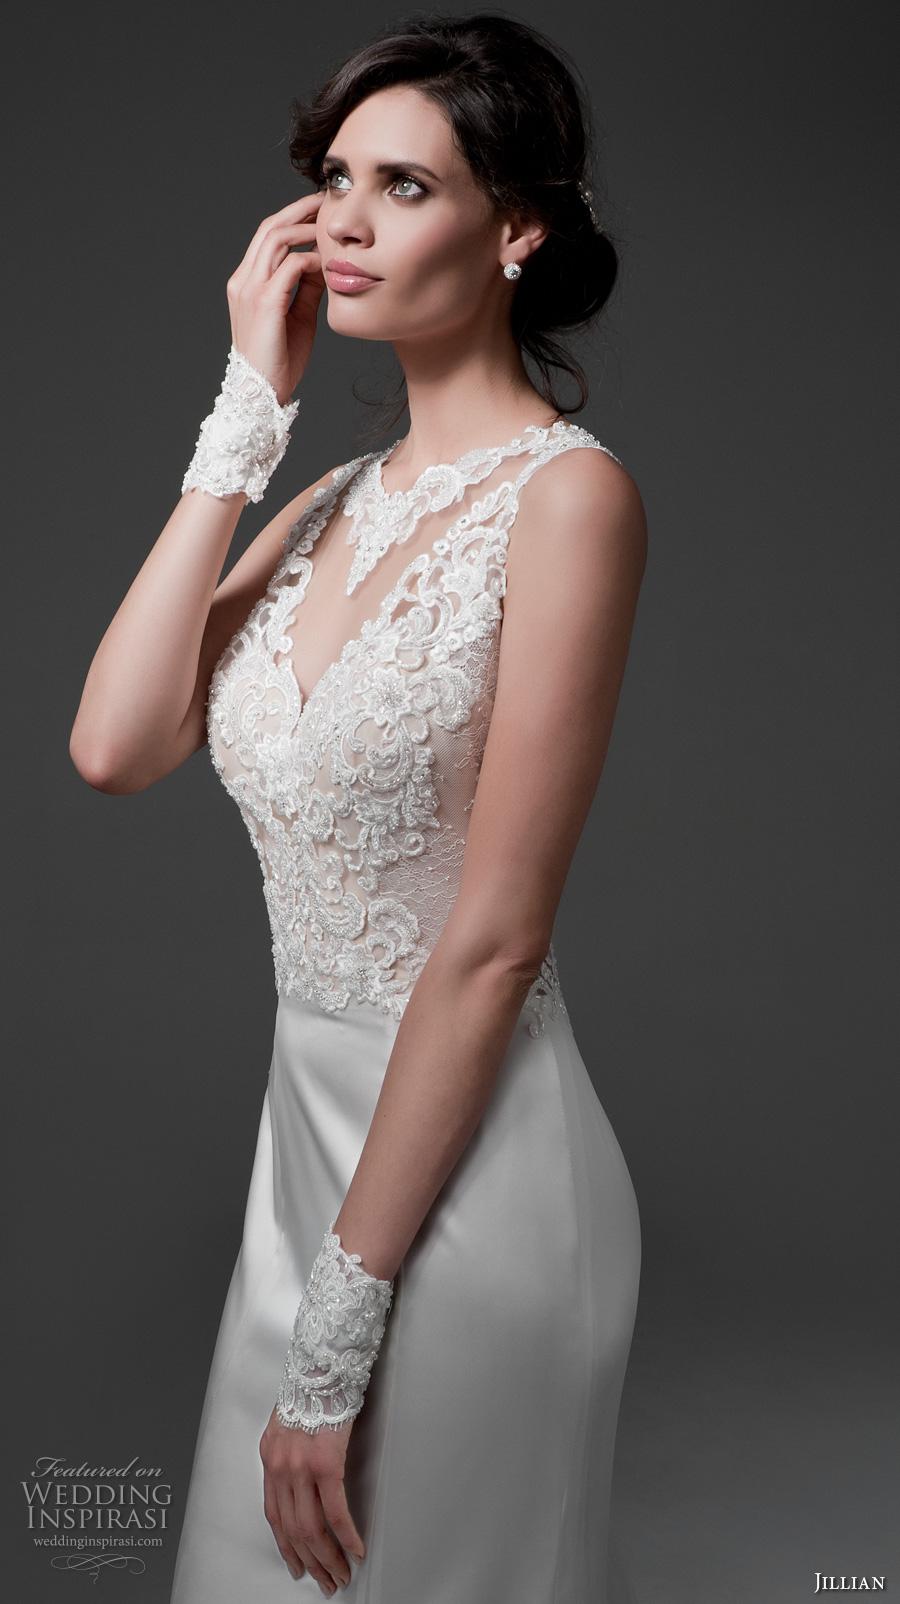 jillian 2017 bridal sleeveless illusion jewel v neckline heavily embellished bodice satin skirt elegant sheath wedding dress illusion back chapel train (mirta) zv